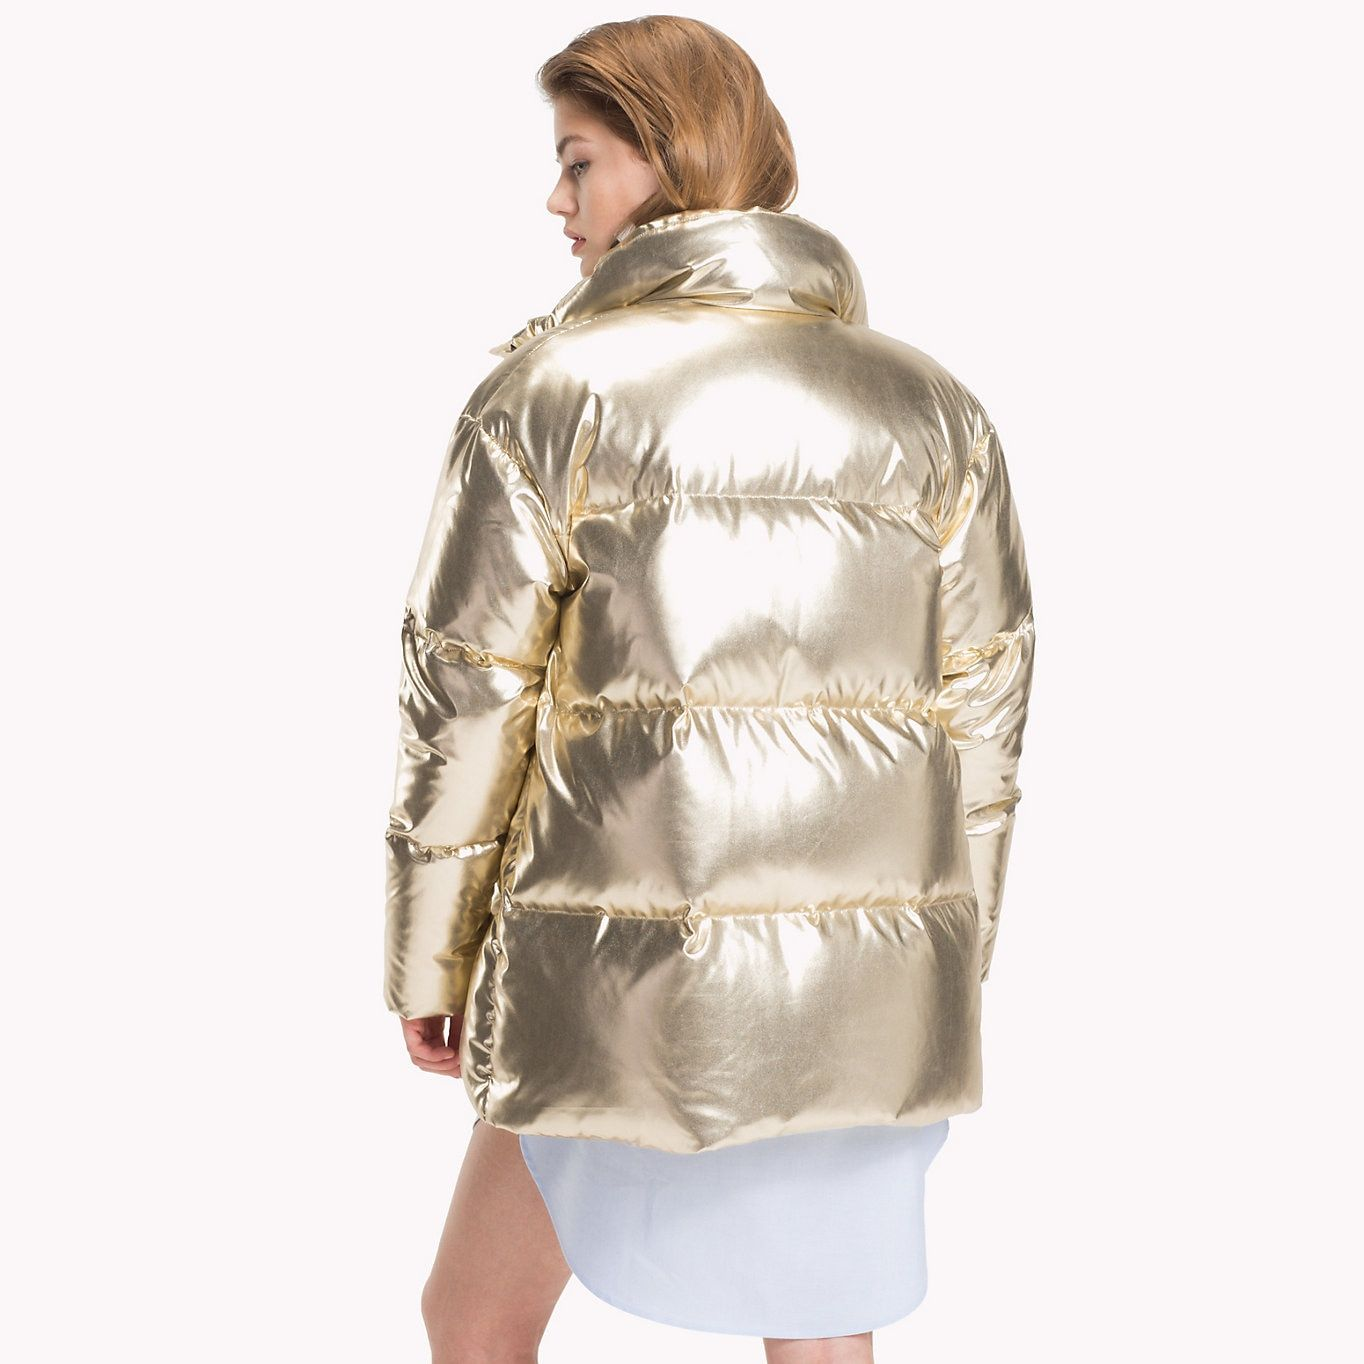 Tommy Hilfiger Tommy Icons Puffer Jacket Rich Gold Tommy Hilfiger Women Detail Image 1 Jacken Daunenjacke Tommy Hilfiger Damen